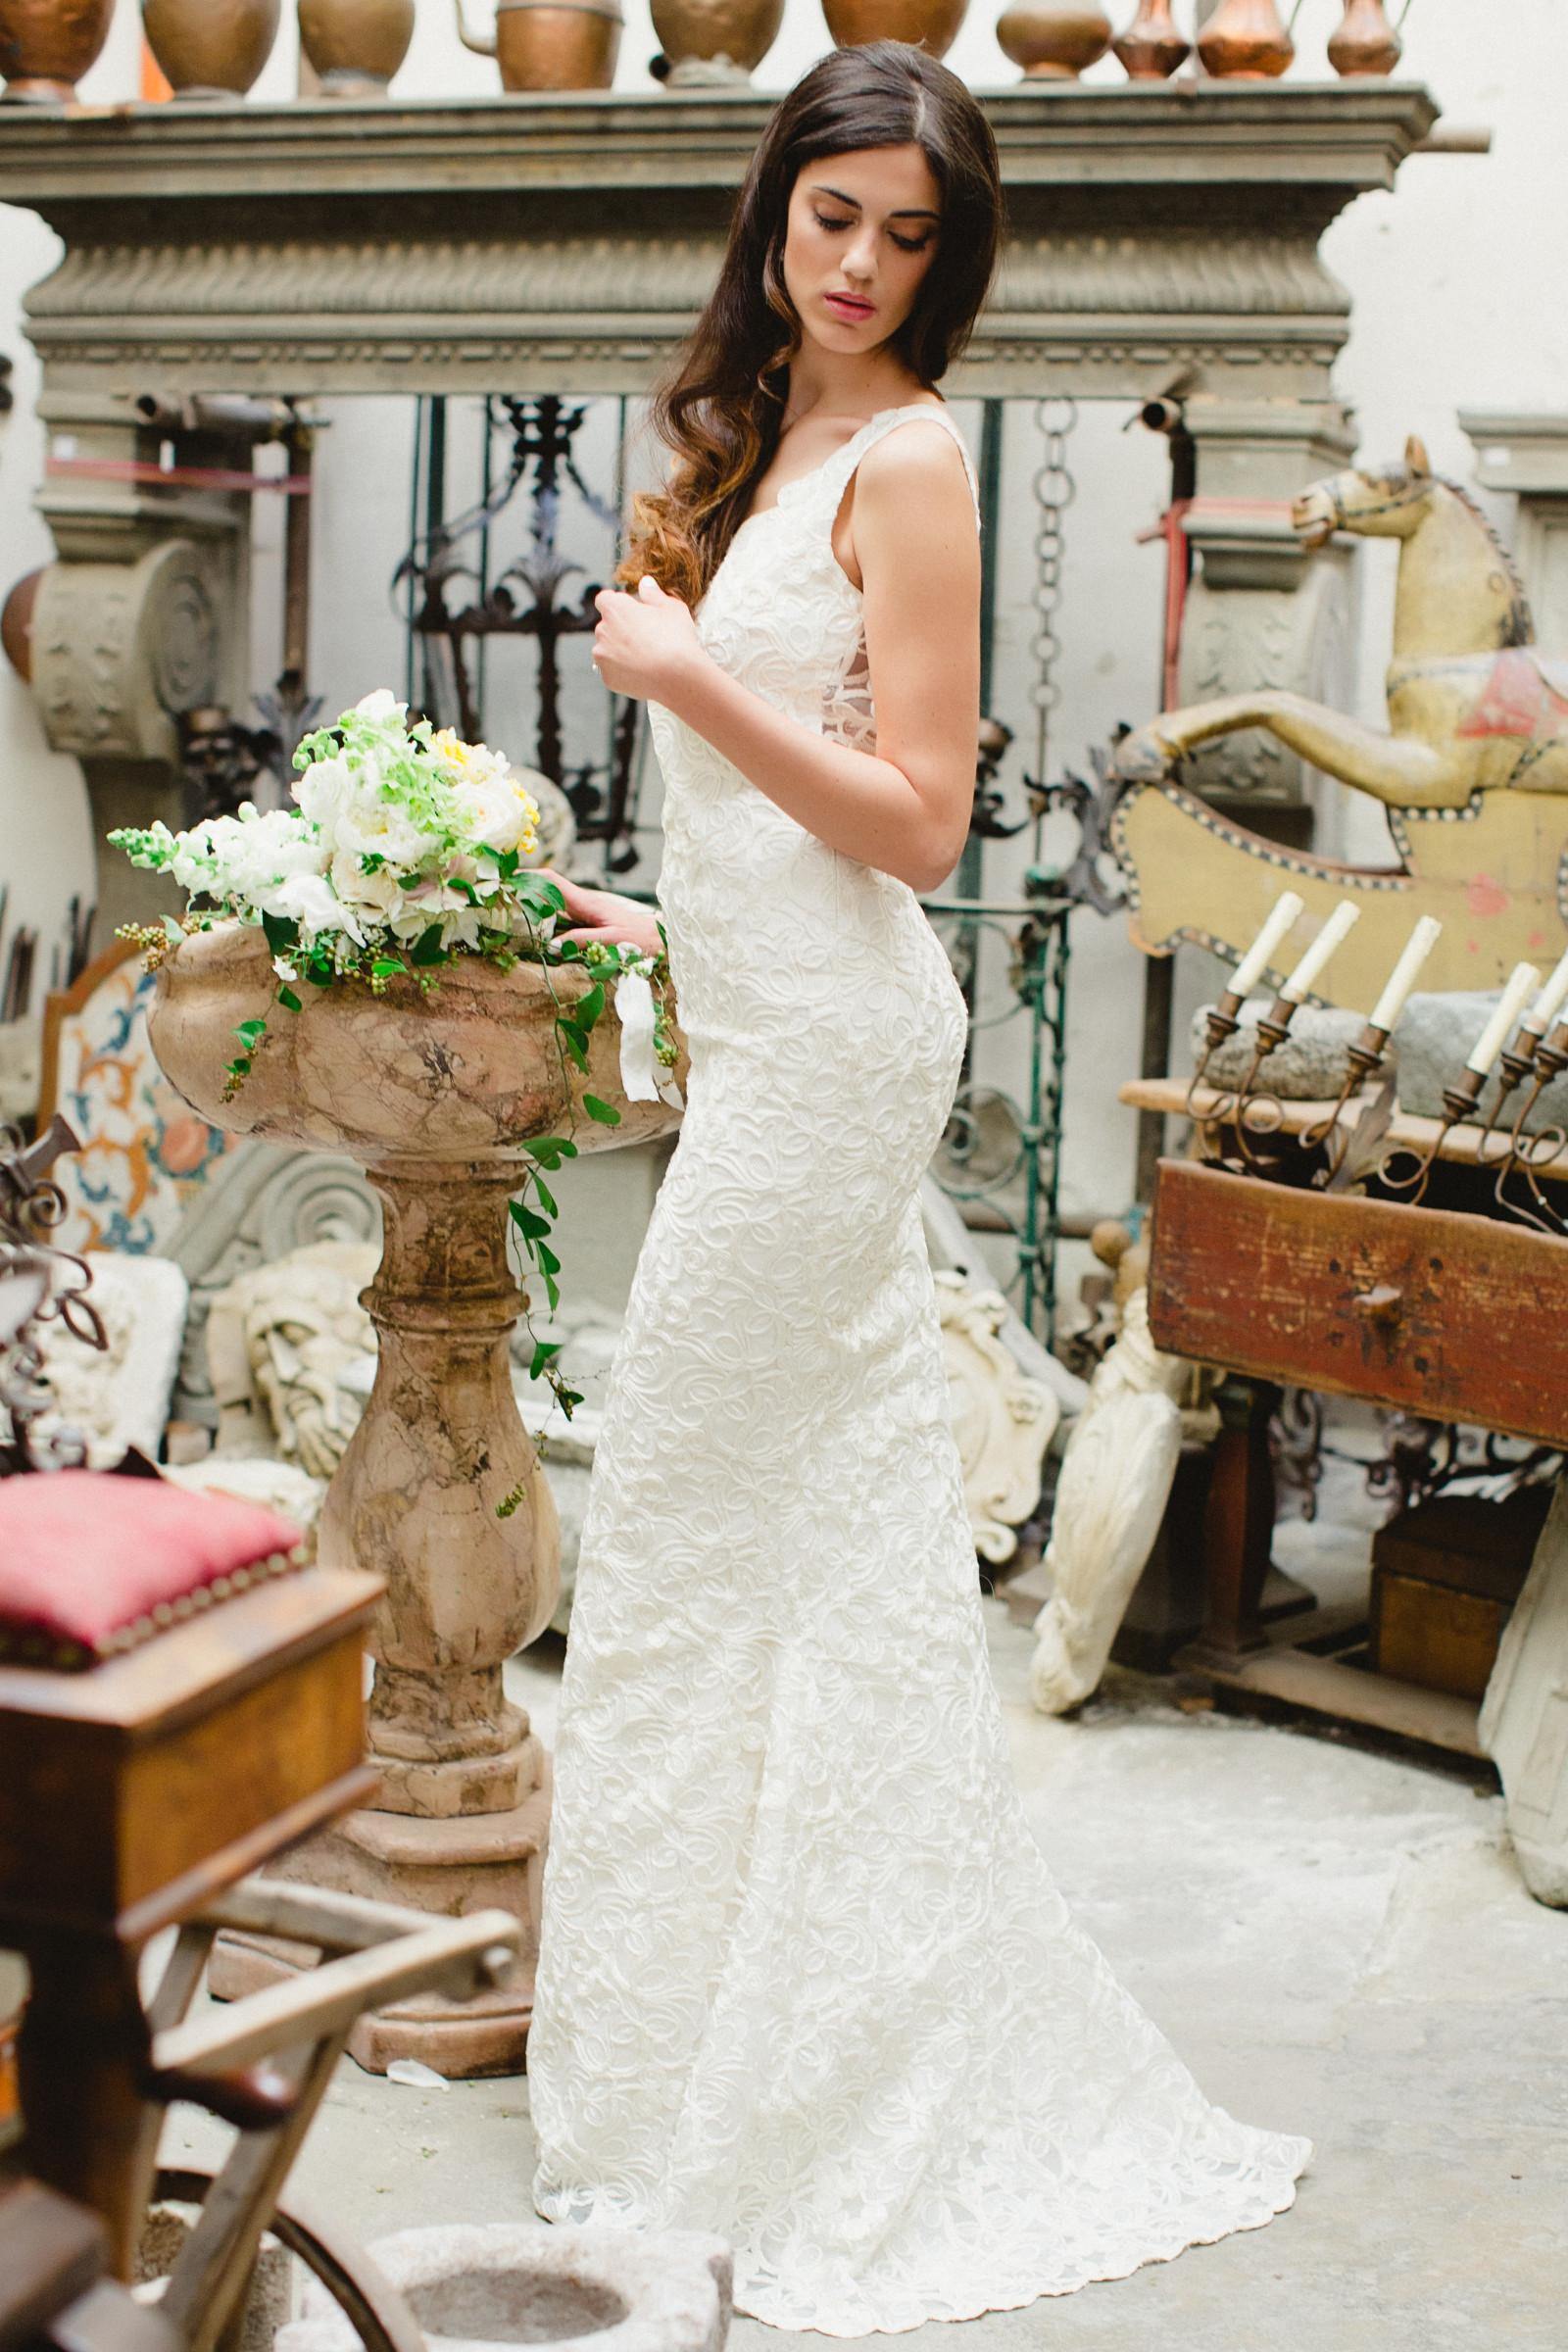 Marianna-Lanzilli-Spose-Made-In-Italy-